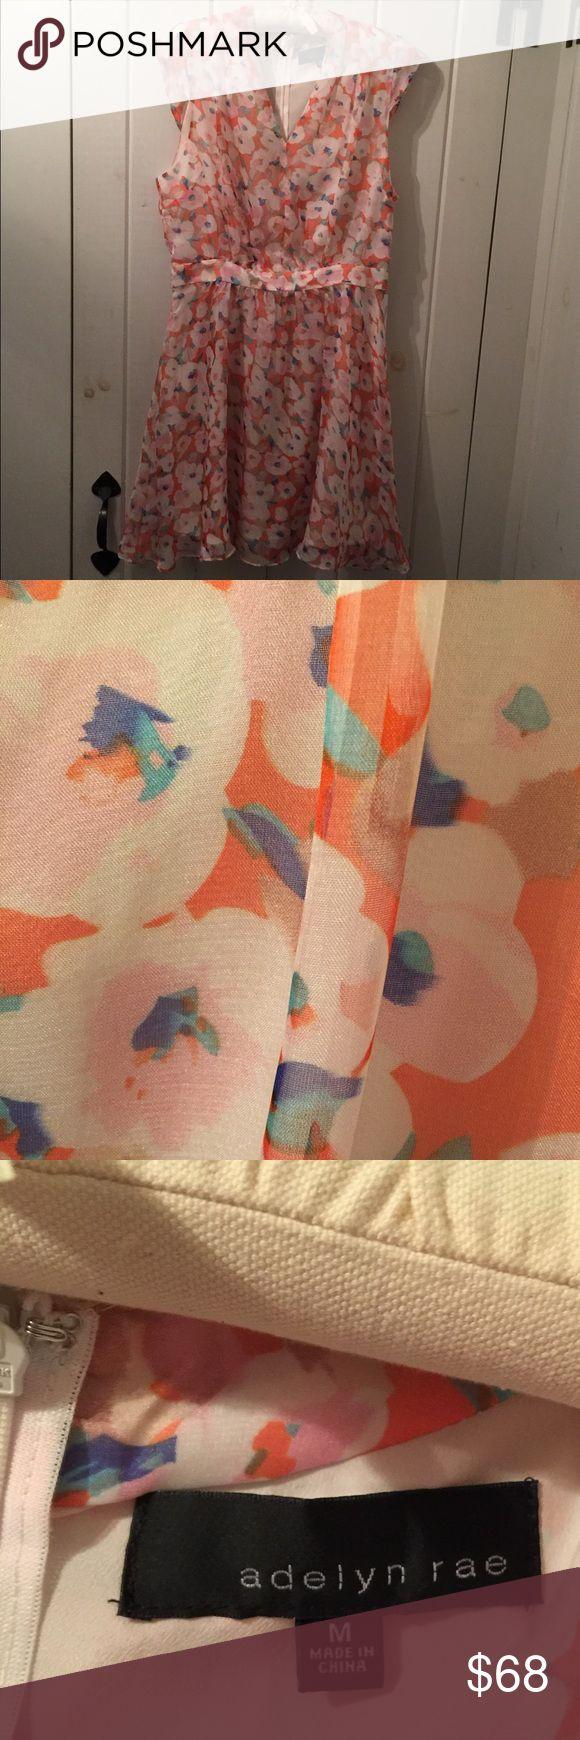 Adelyne Rae fit & flare dress Adelyn Rae fit & flare dress NWT  super cute peach colored flower print lightweight fabric great for summer fun Adelyn Rae Dresses Midi